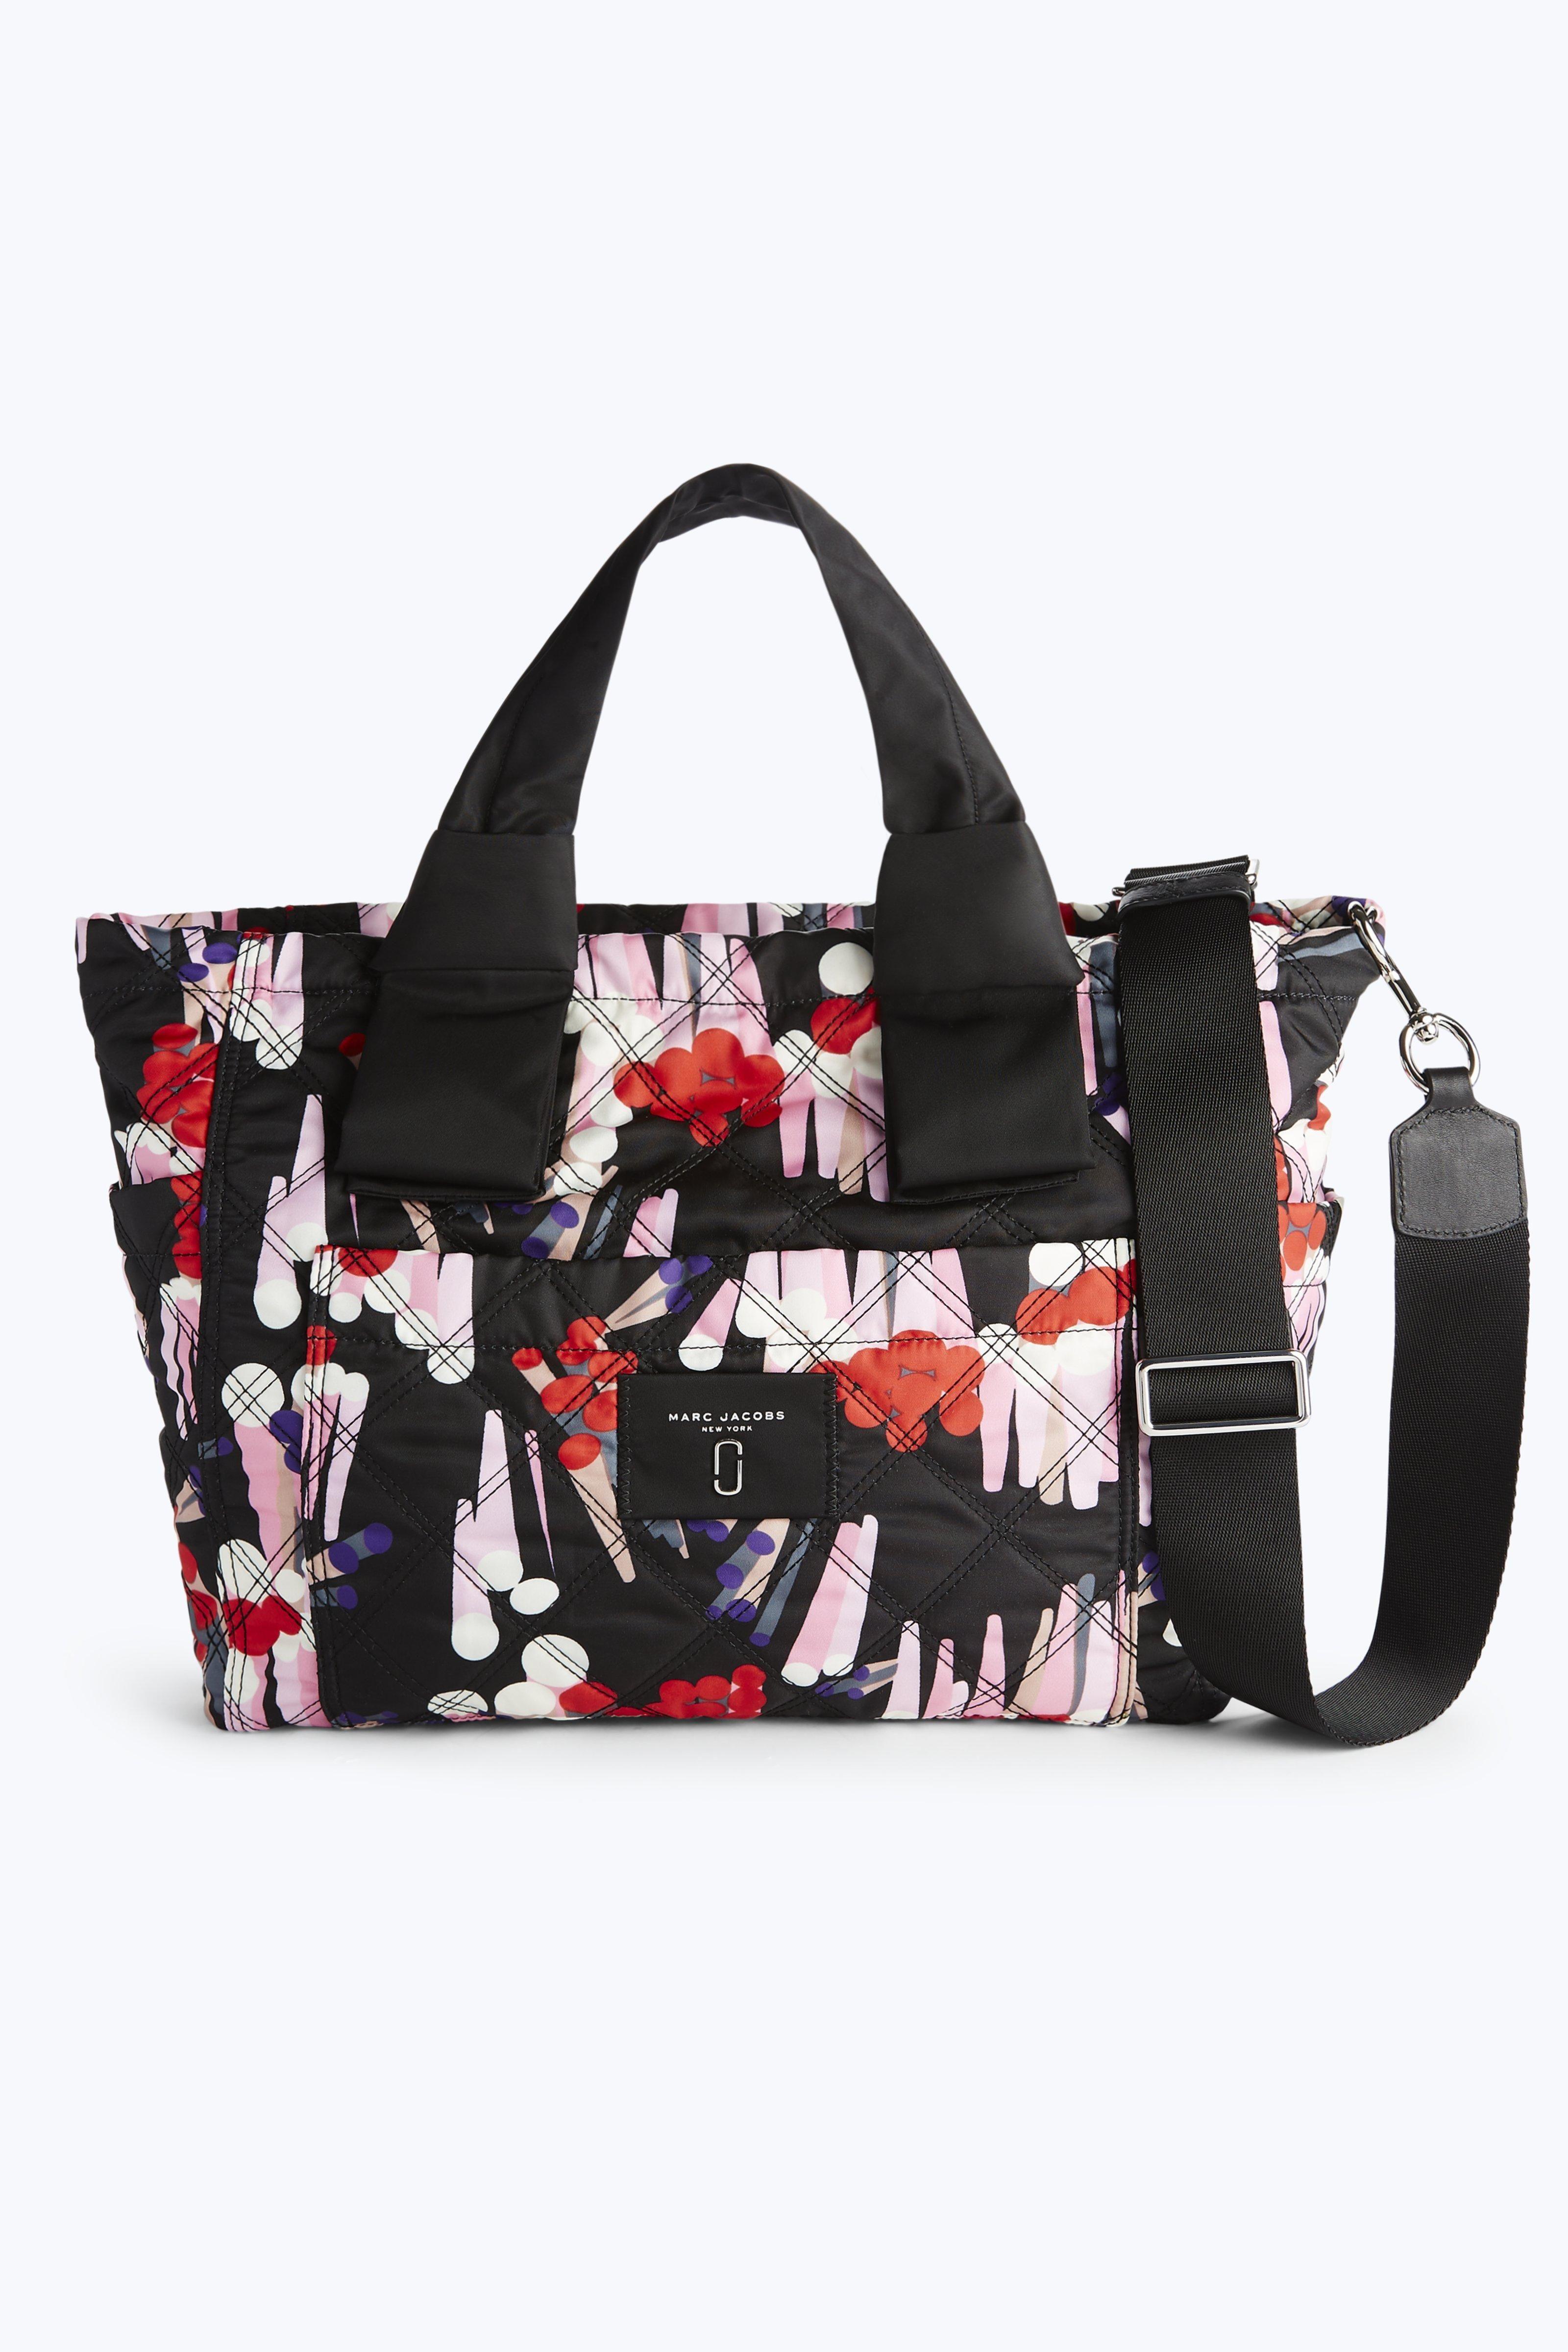 66eb8c97b16a MARC JACOBS Printed Nylon Knot Babybag.  marcjacobs  bags  baby bags  nylon